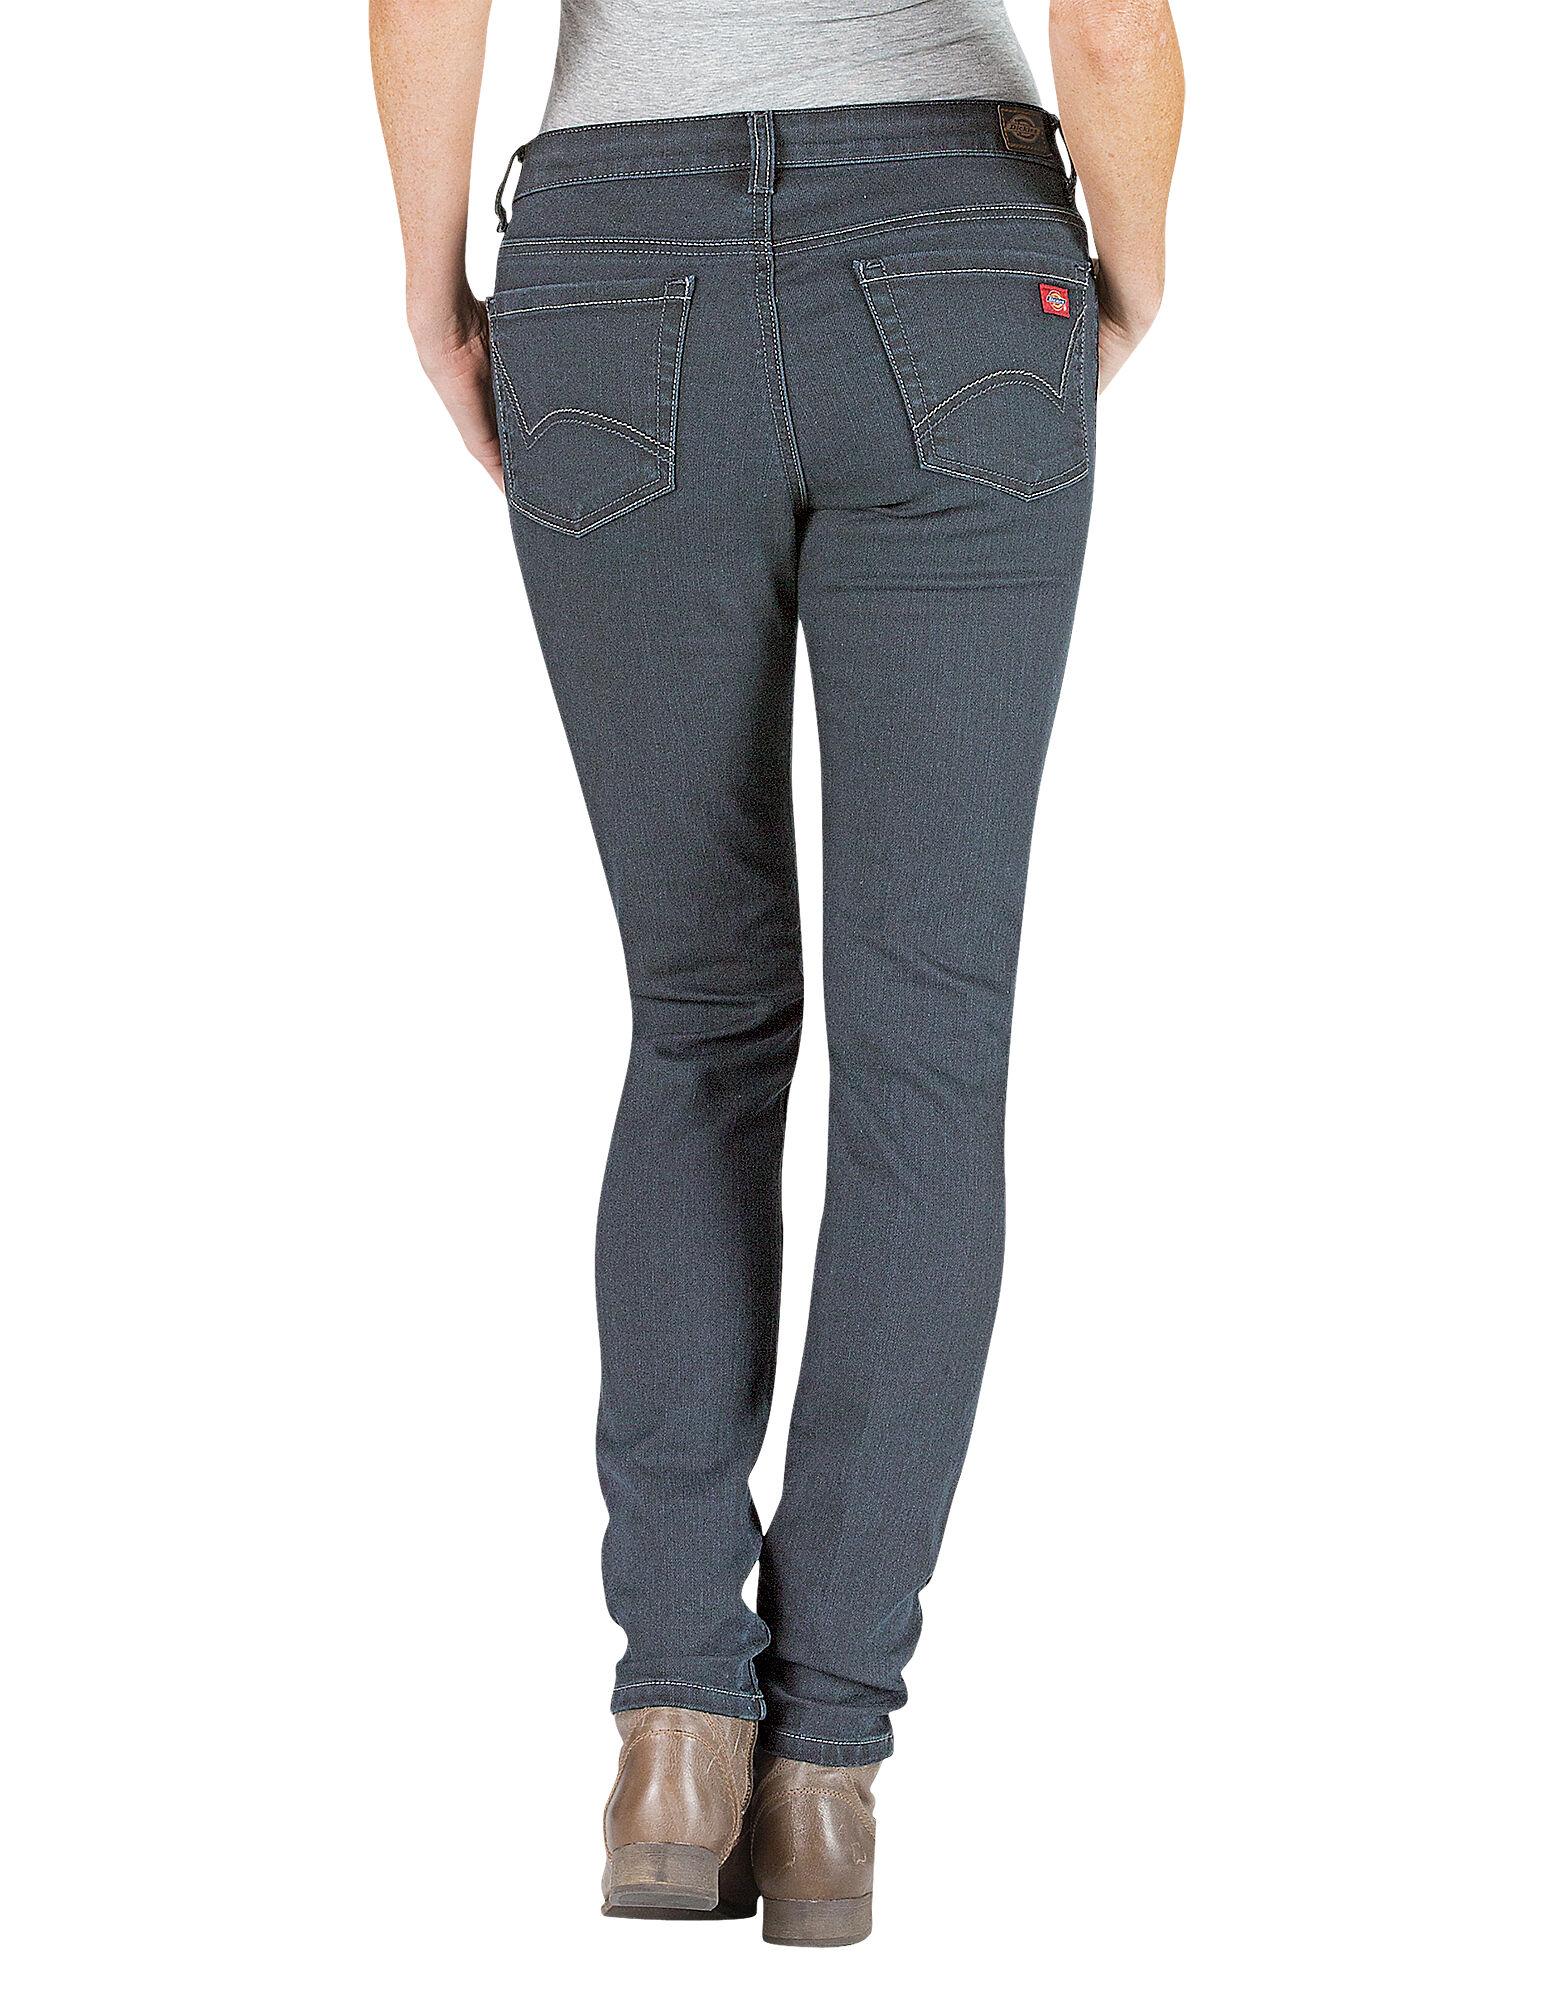 Women&39s Slim Fit Skinny Leg Denim Jean | Womens Jeans | Dickies